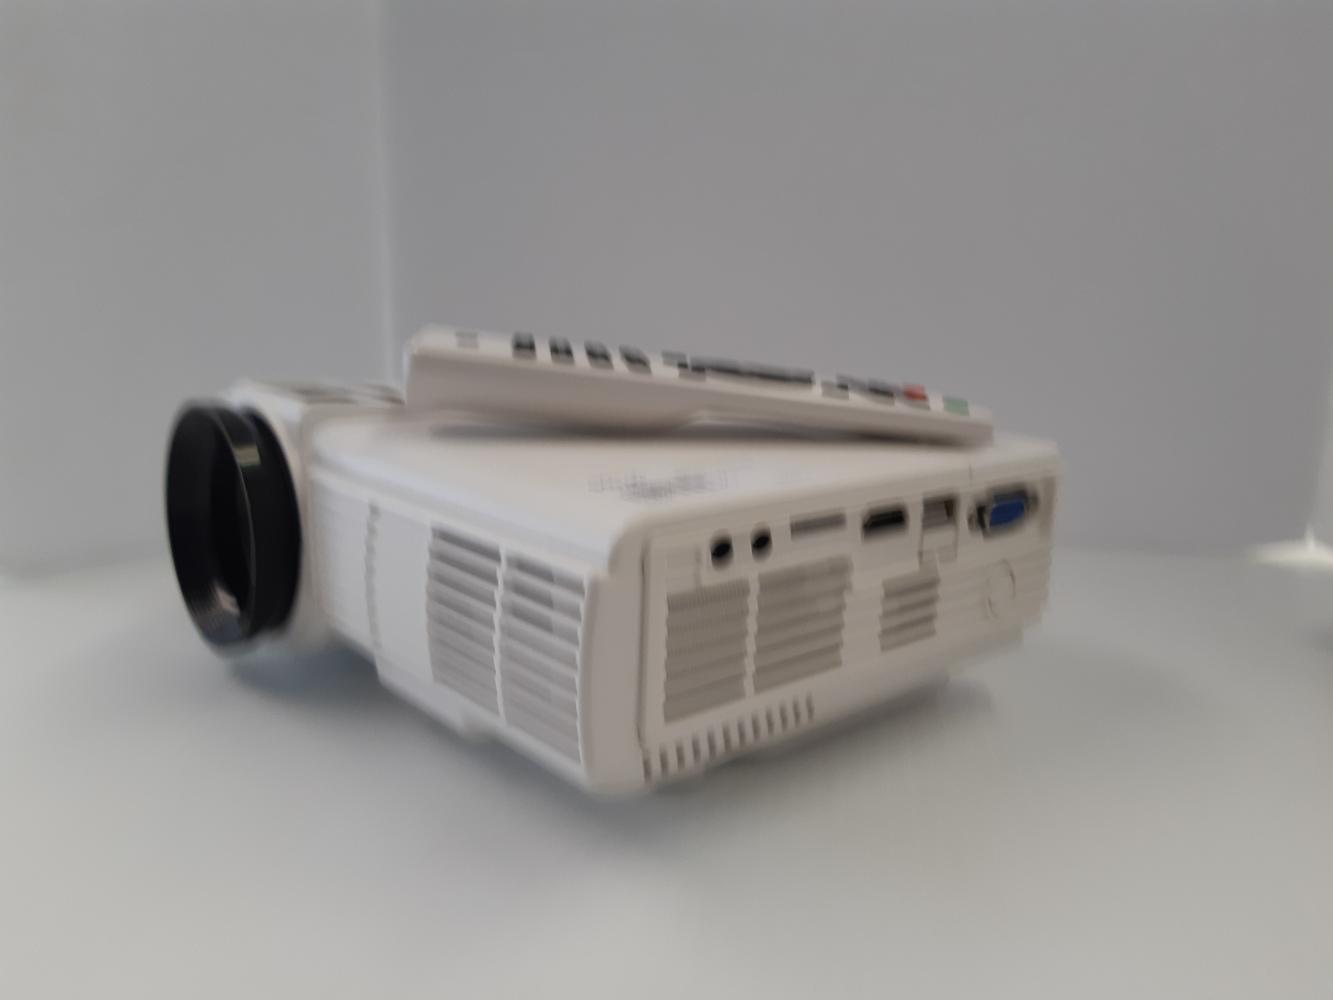 RCA Projector | Avenue Shop Swap & Sell